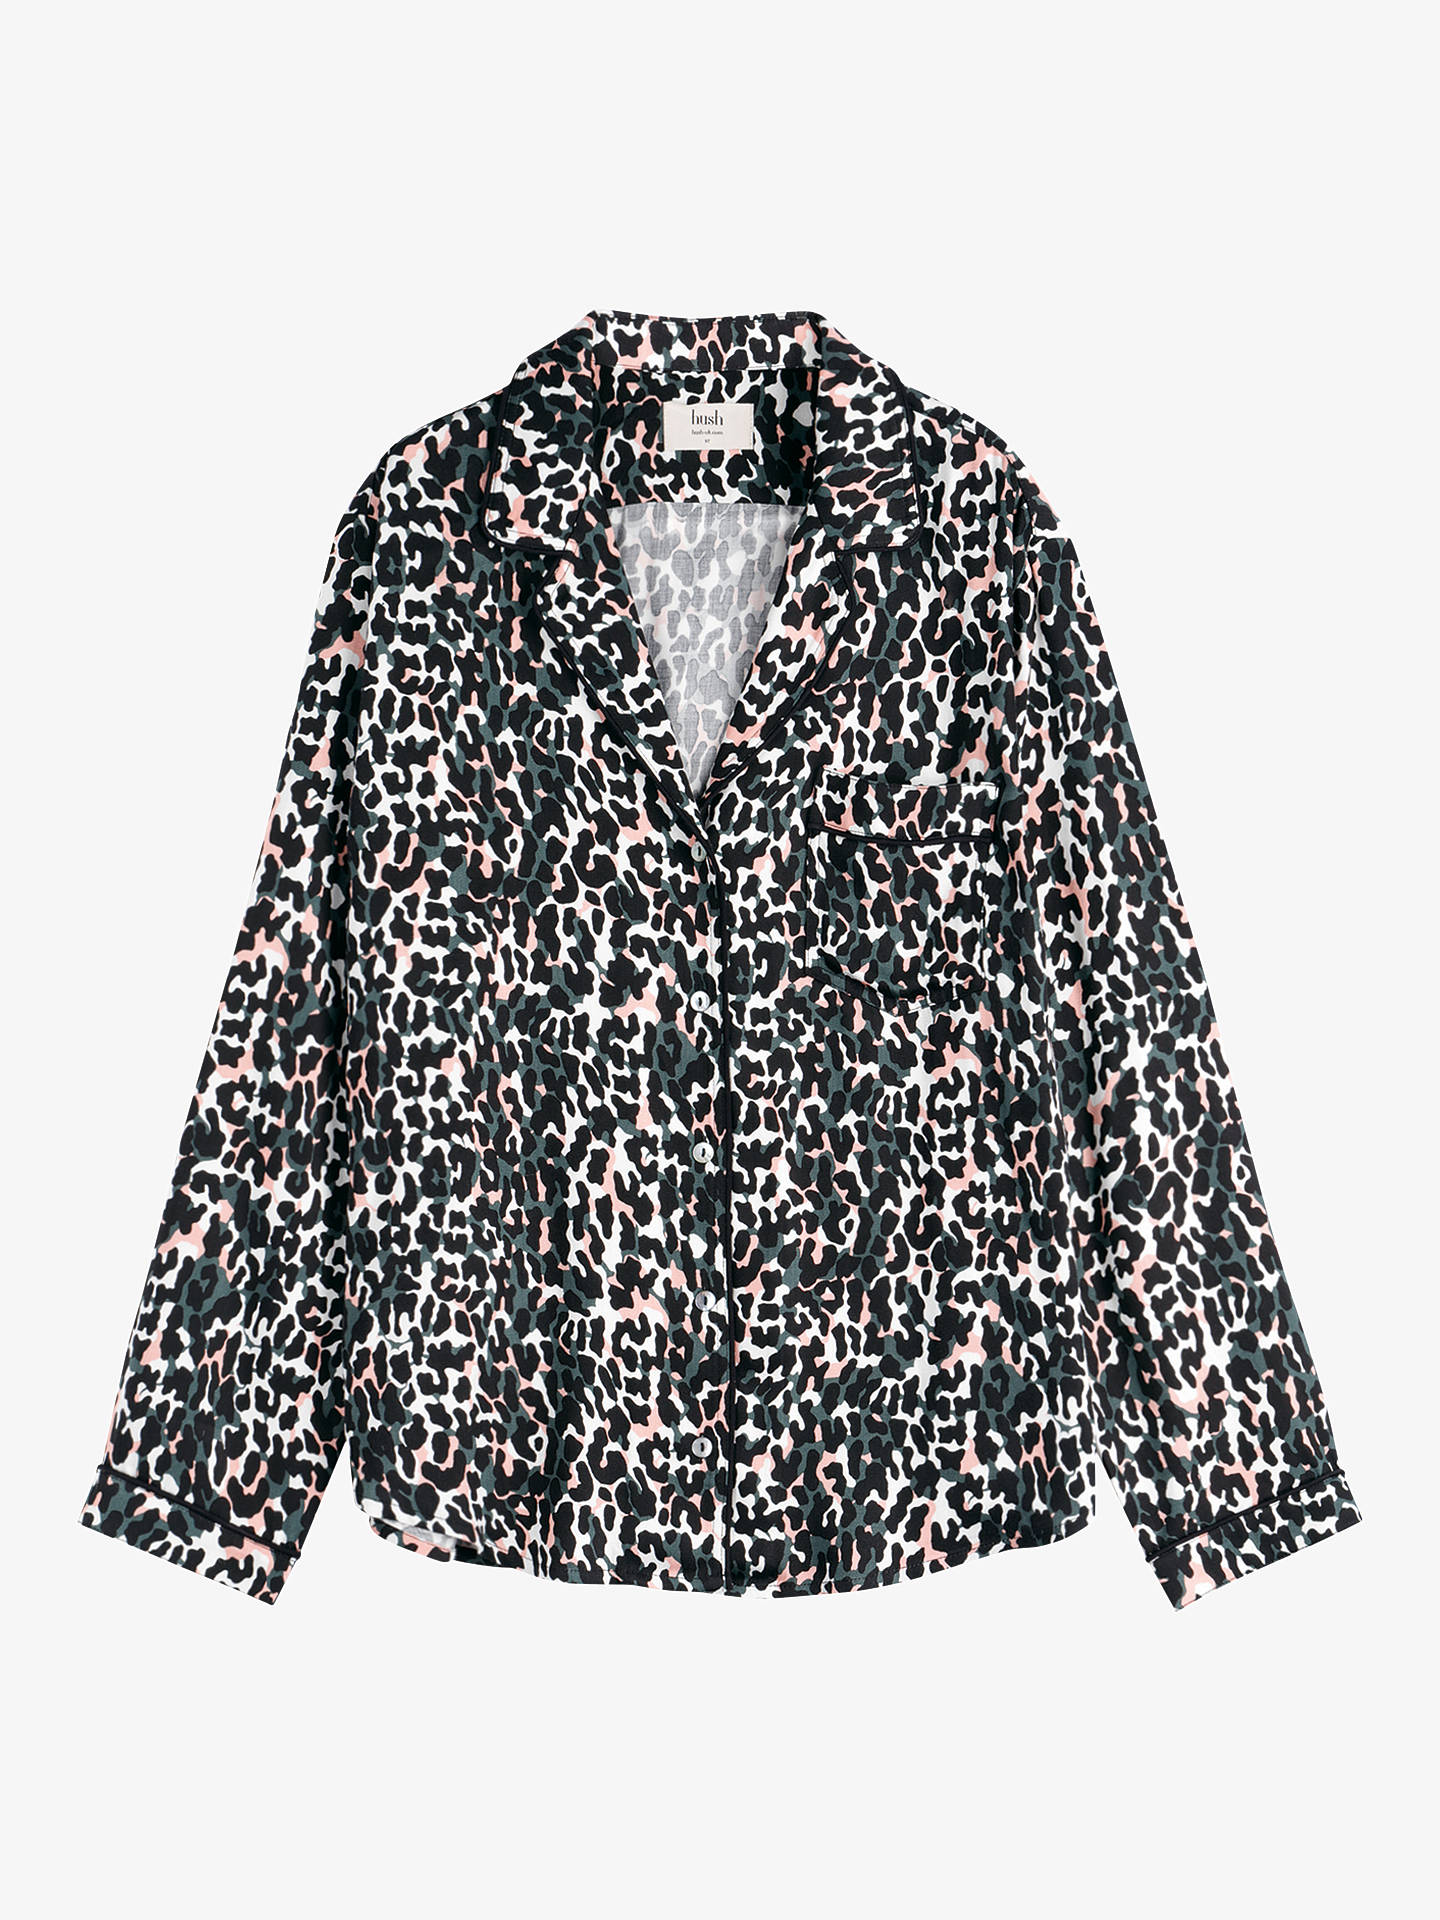 86345c19a8 hush Piped Animal Printed Shirt, Camo Leopard